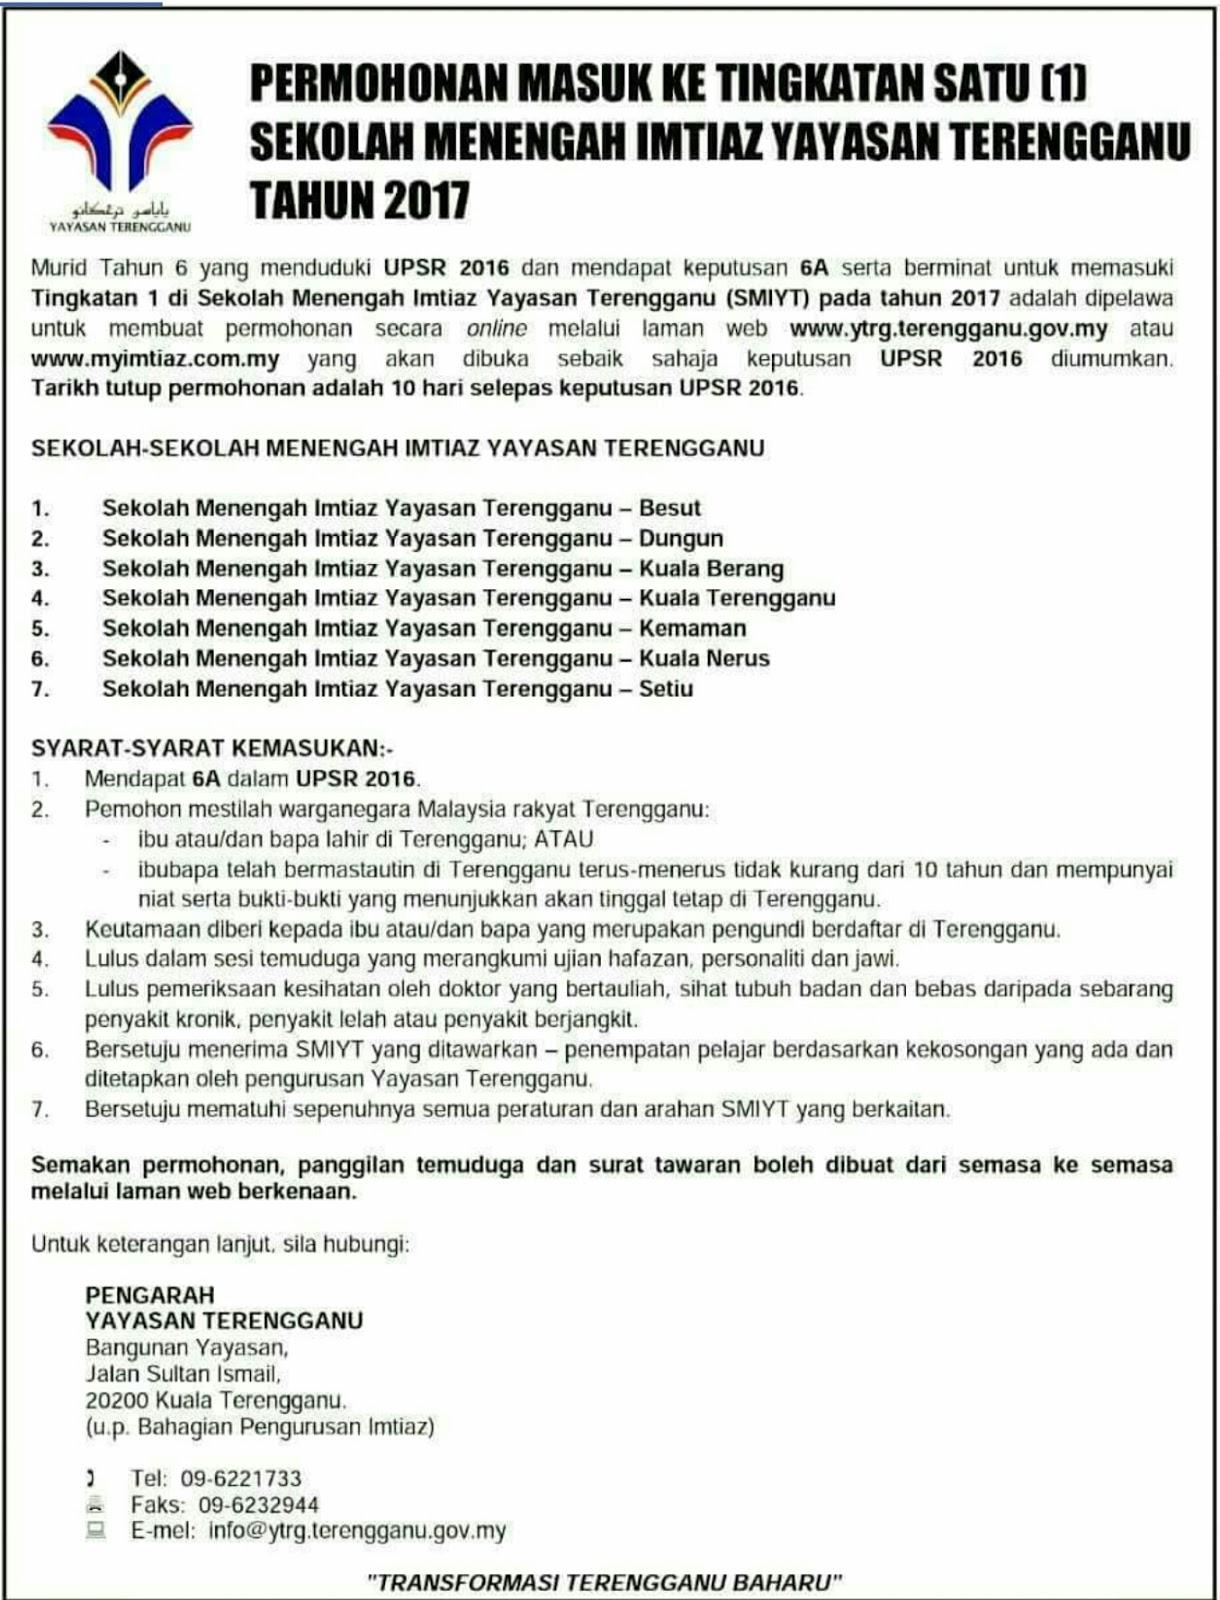 Yayasan Terengganu Semakan Bertanya X